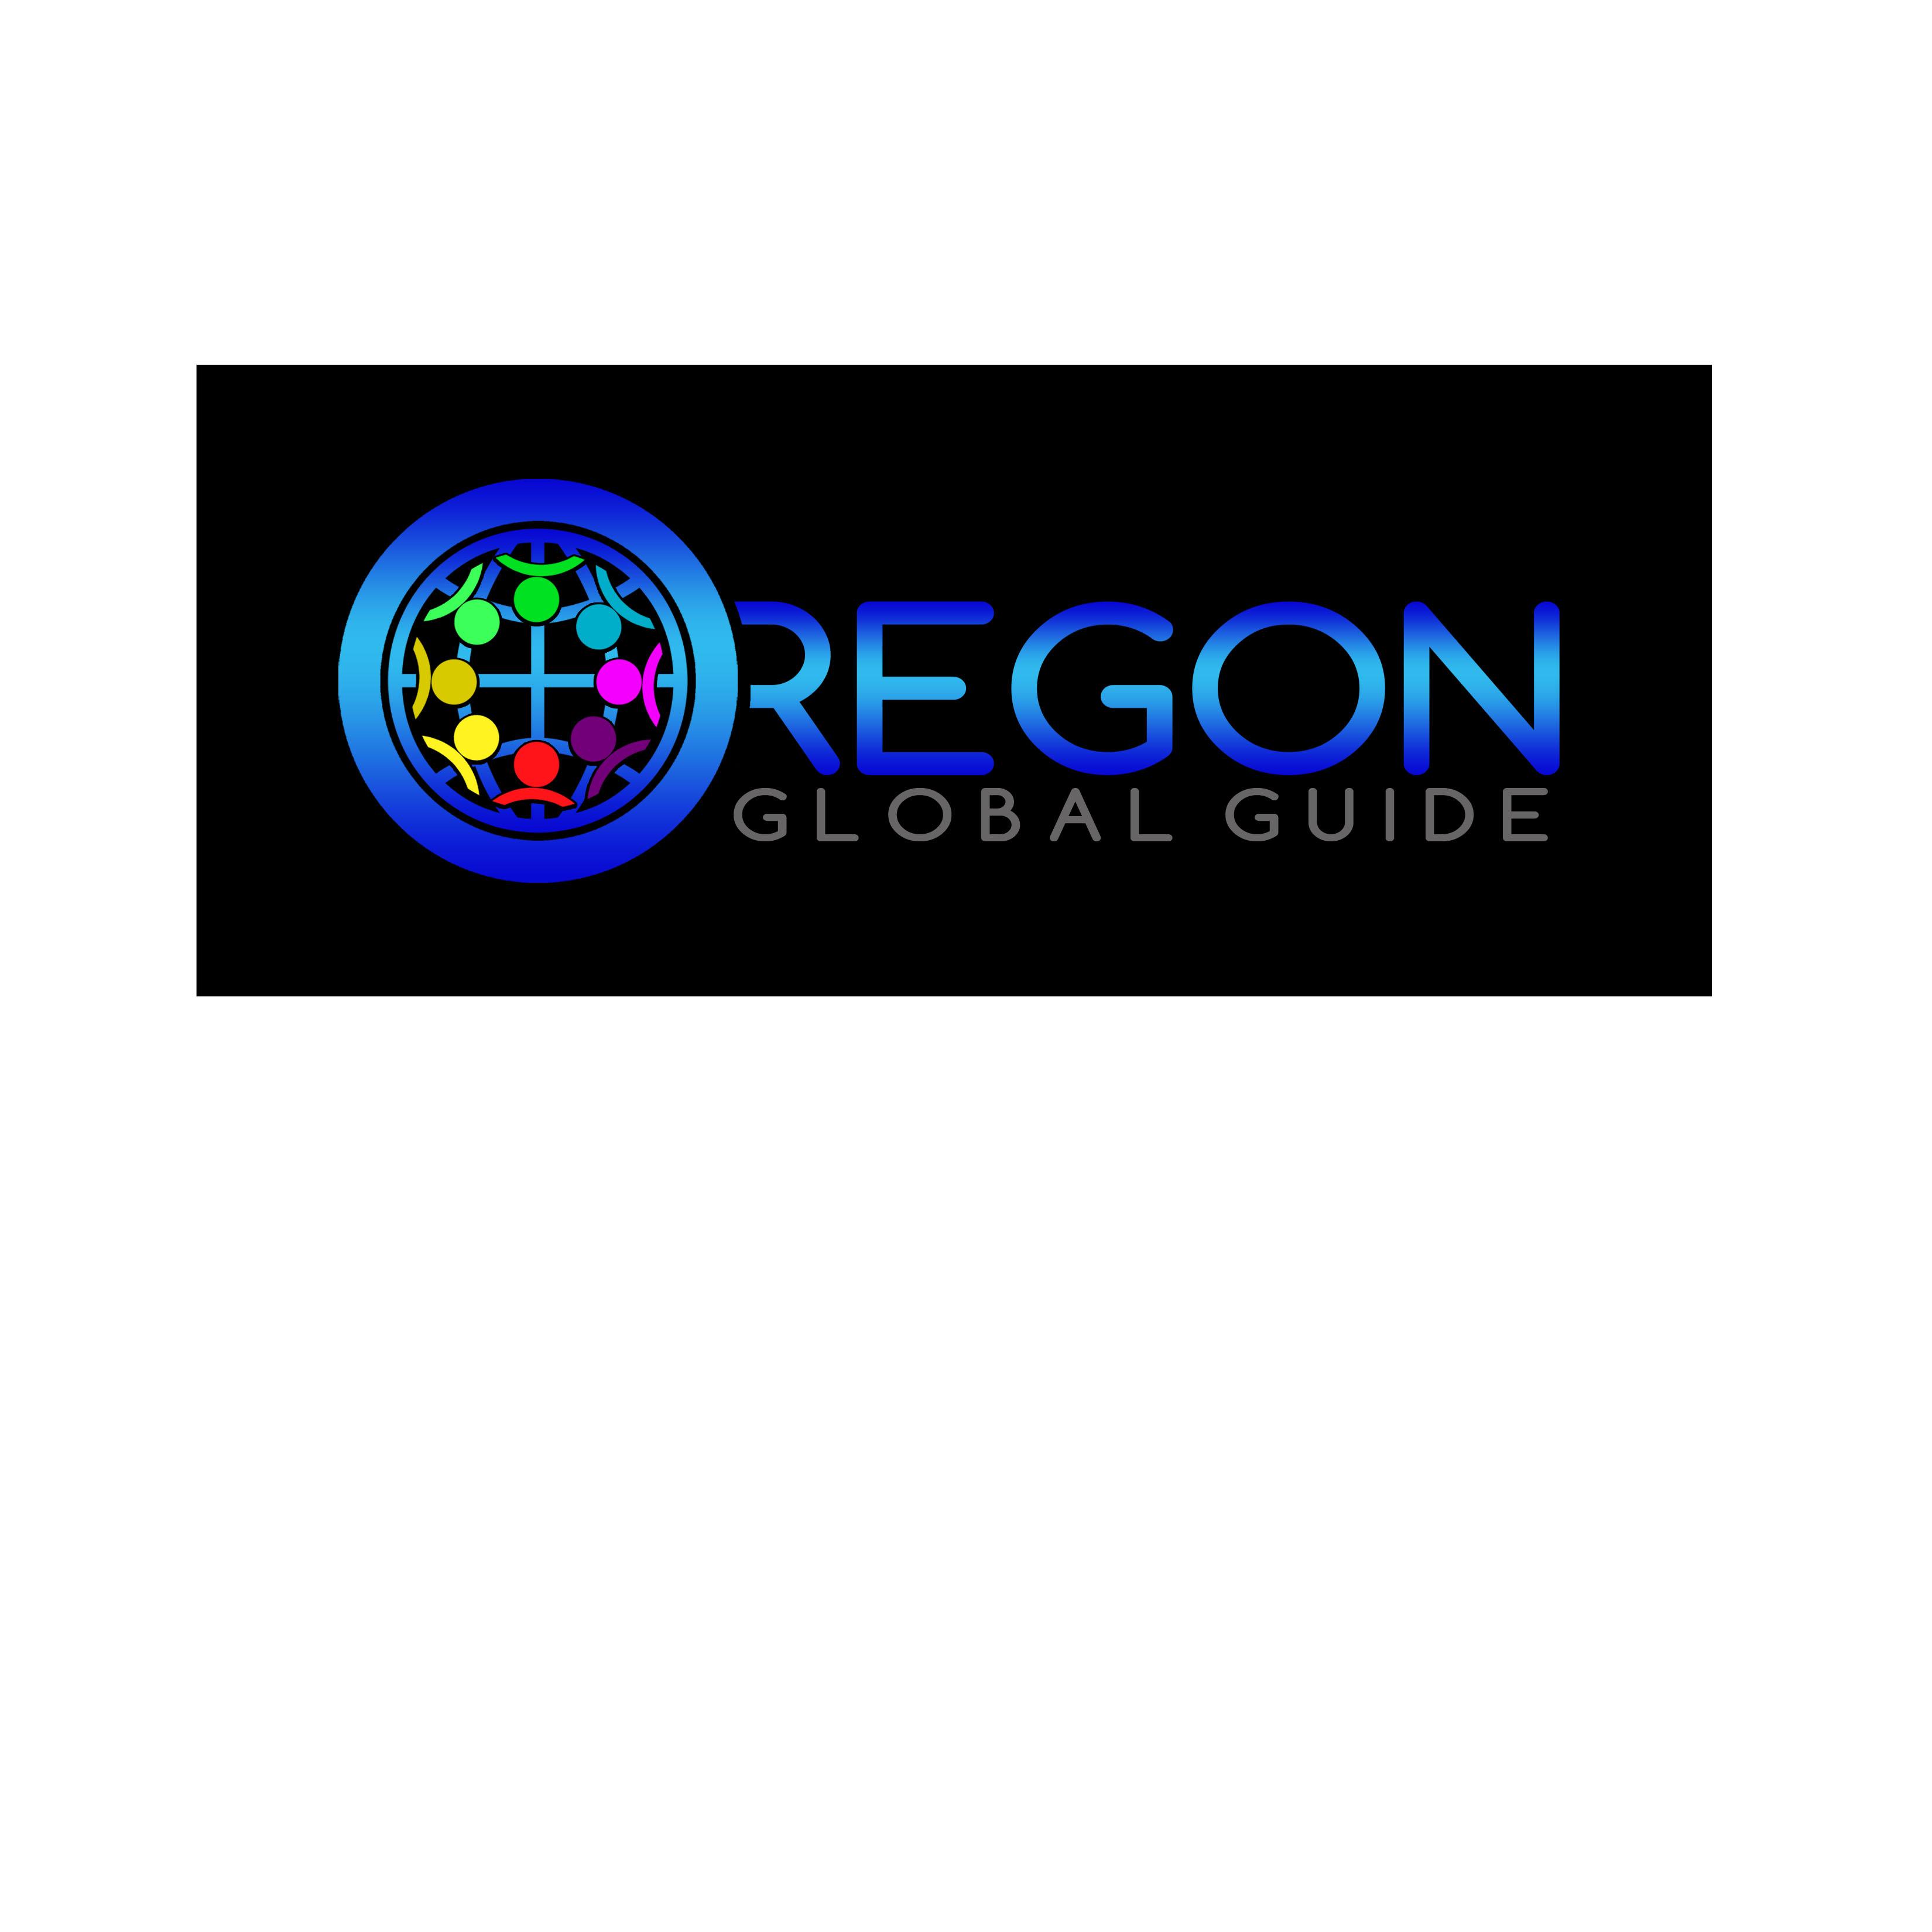 Logo Design by Allan Esclamado - Entry No. 74 in the Logo Design Contest New Logo Design for Oregon Global Guide.